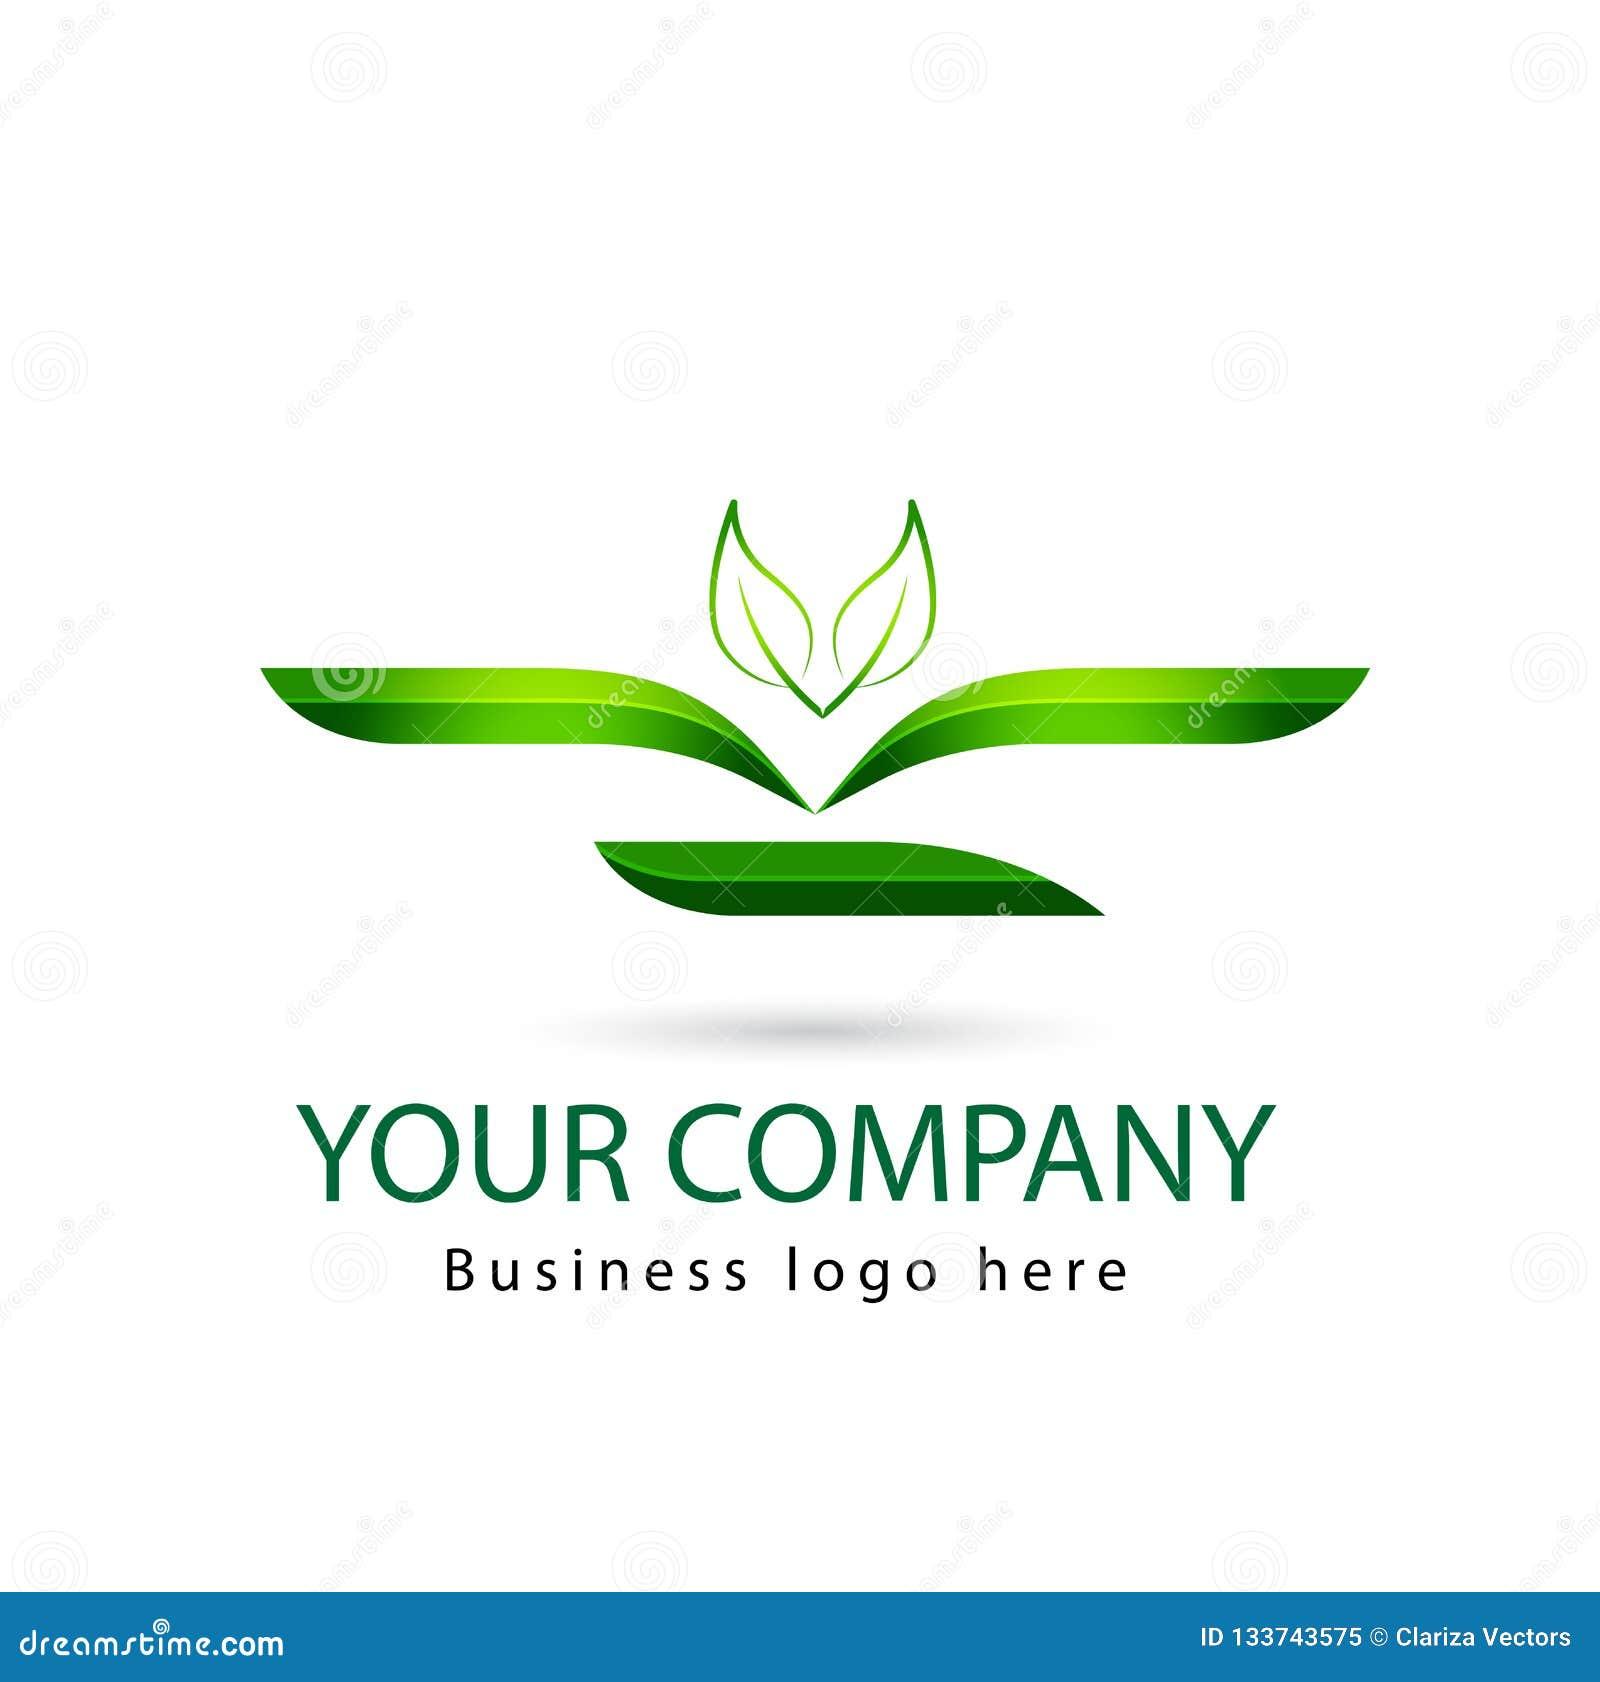 Grüne Farbeblatt, Anlage, Logosatz, Ökologie, Leute, Wellness, Blätter, Natursymbolikonen-Vektorentwürfe